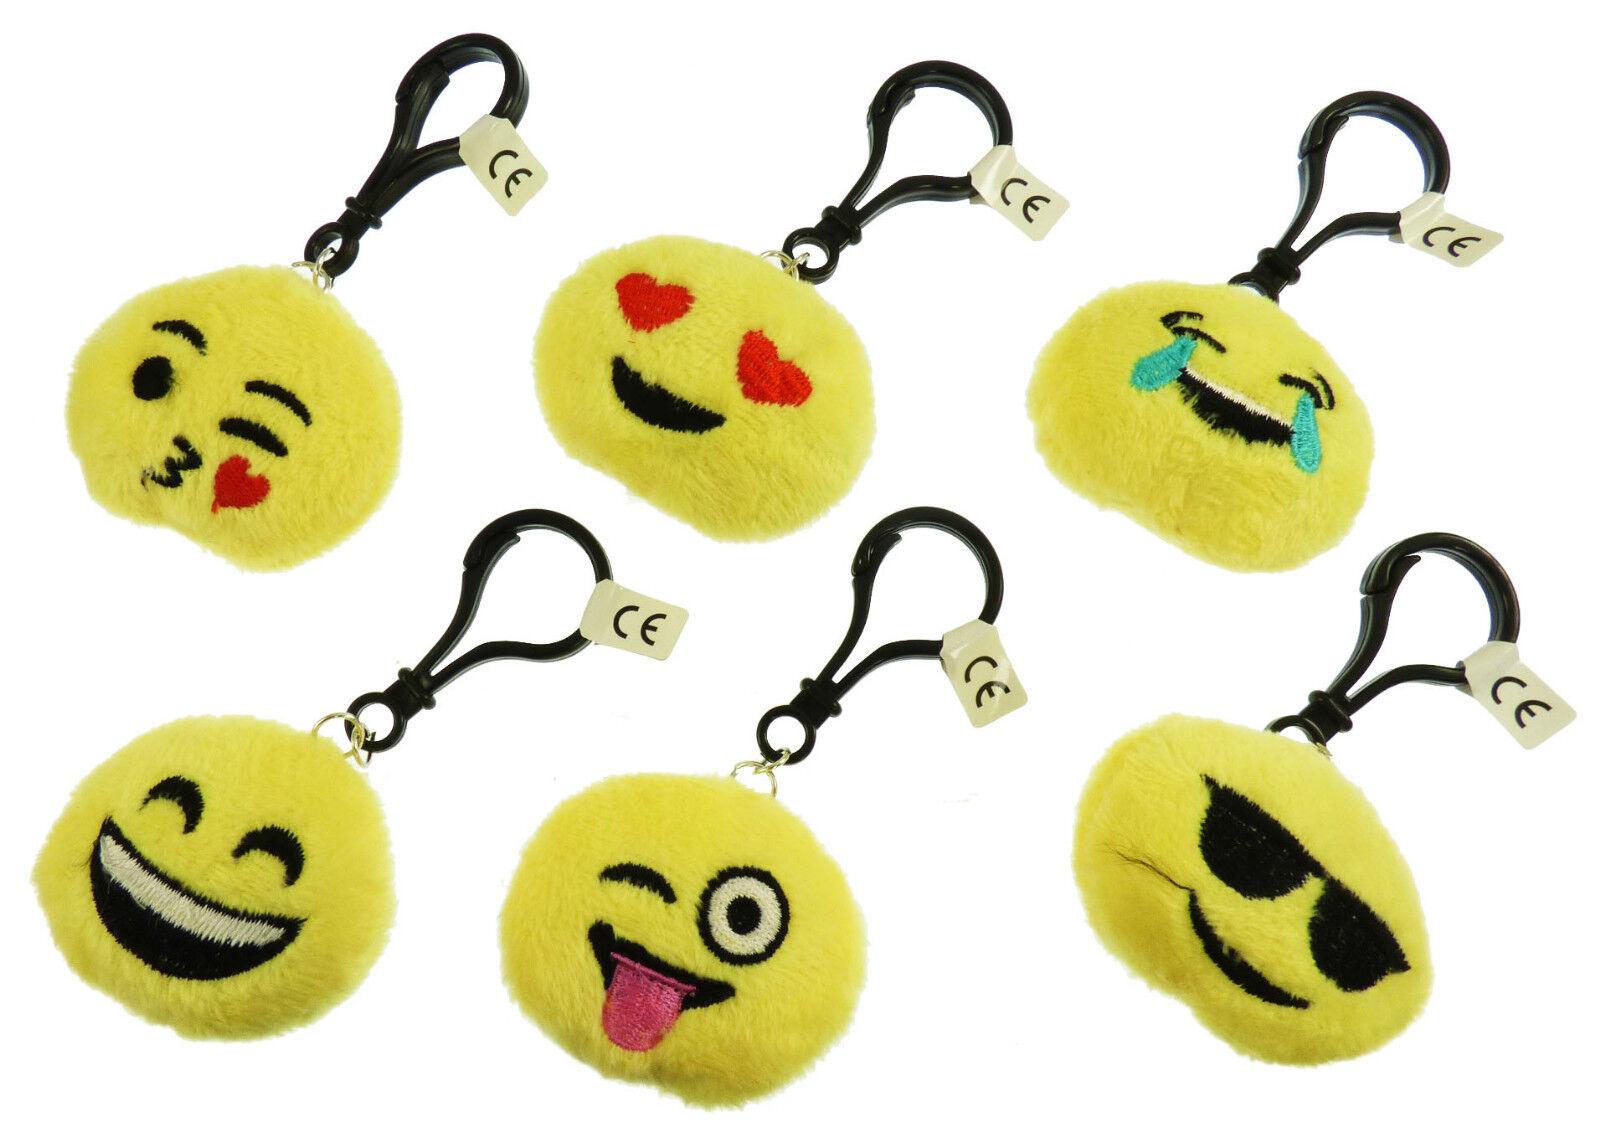 100 NEW Wholesale 5cm Plush Pillow Pillow Pillow Emoticon Emoji Clip On Keyrings - 6 designs a7c03e